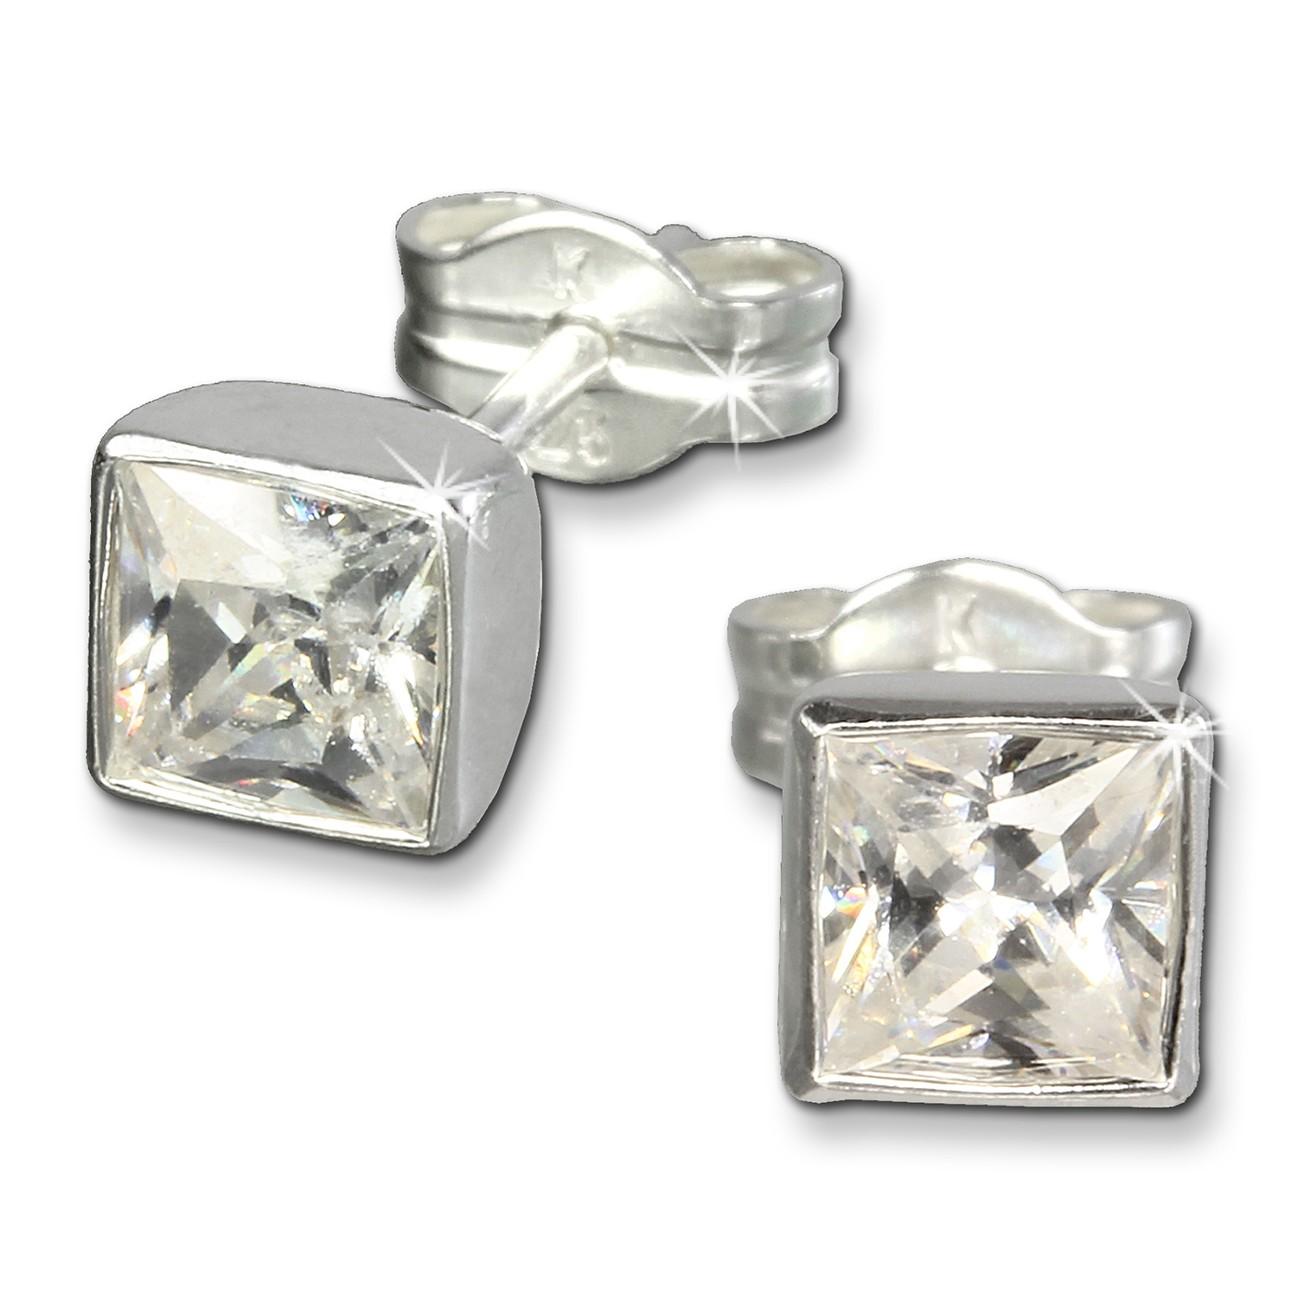 SilberDream Ohrringe Zirkonia weiß 925 Silber Ohrstecker SDO558W